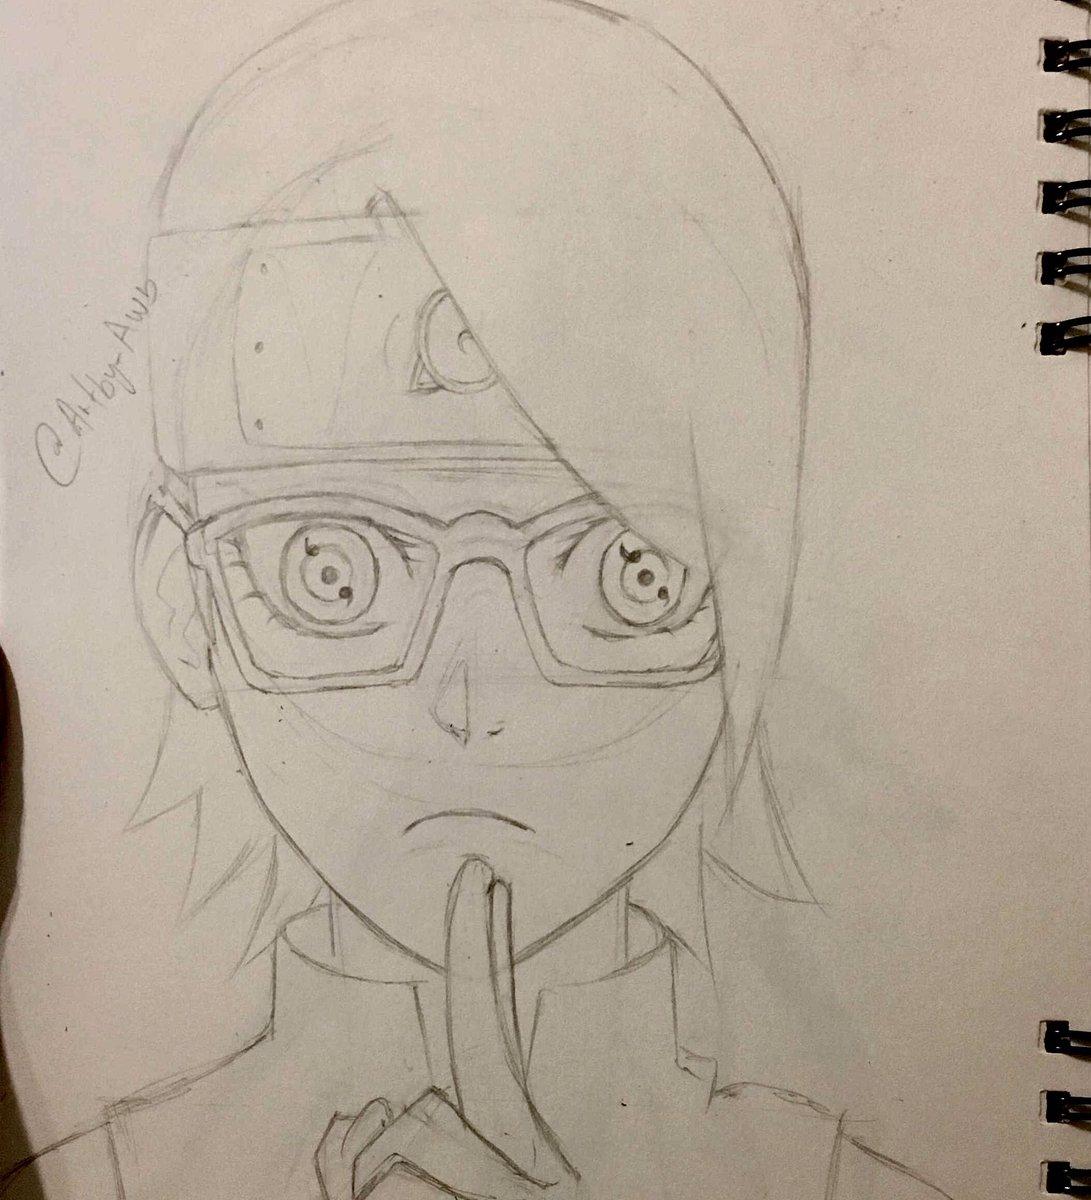 Anime Artist On Twitter Uchihasarada From Boruto Animedrawing Drawing Draw Art Doodle Sketch Fanart Manga Sarada